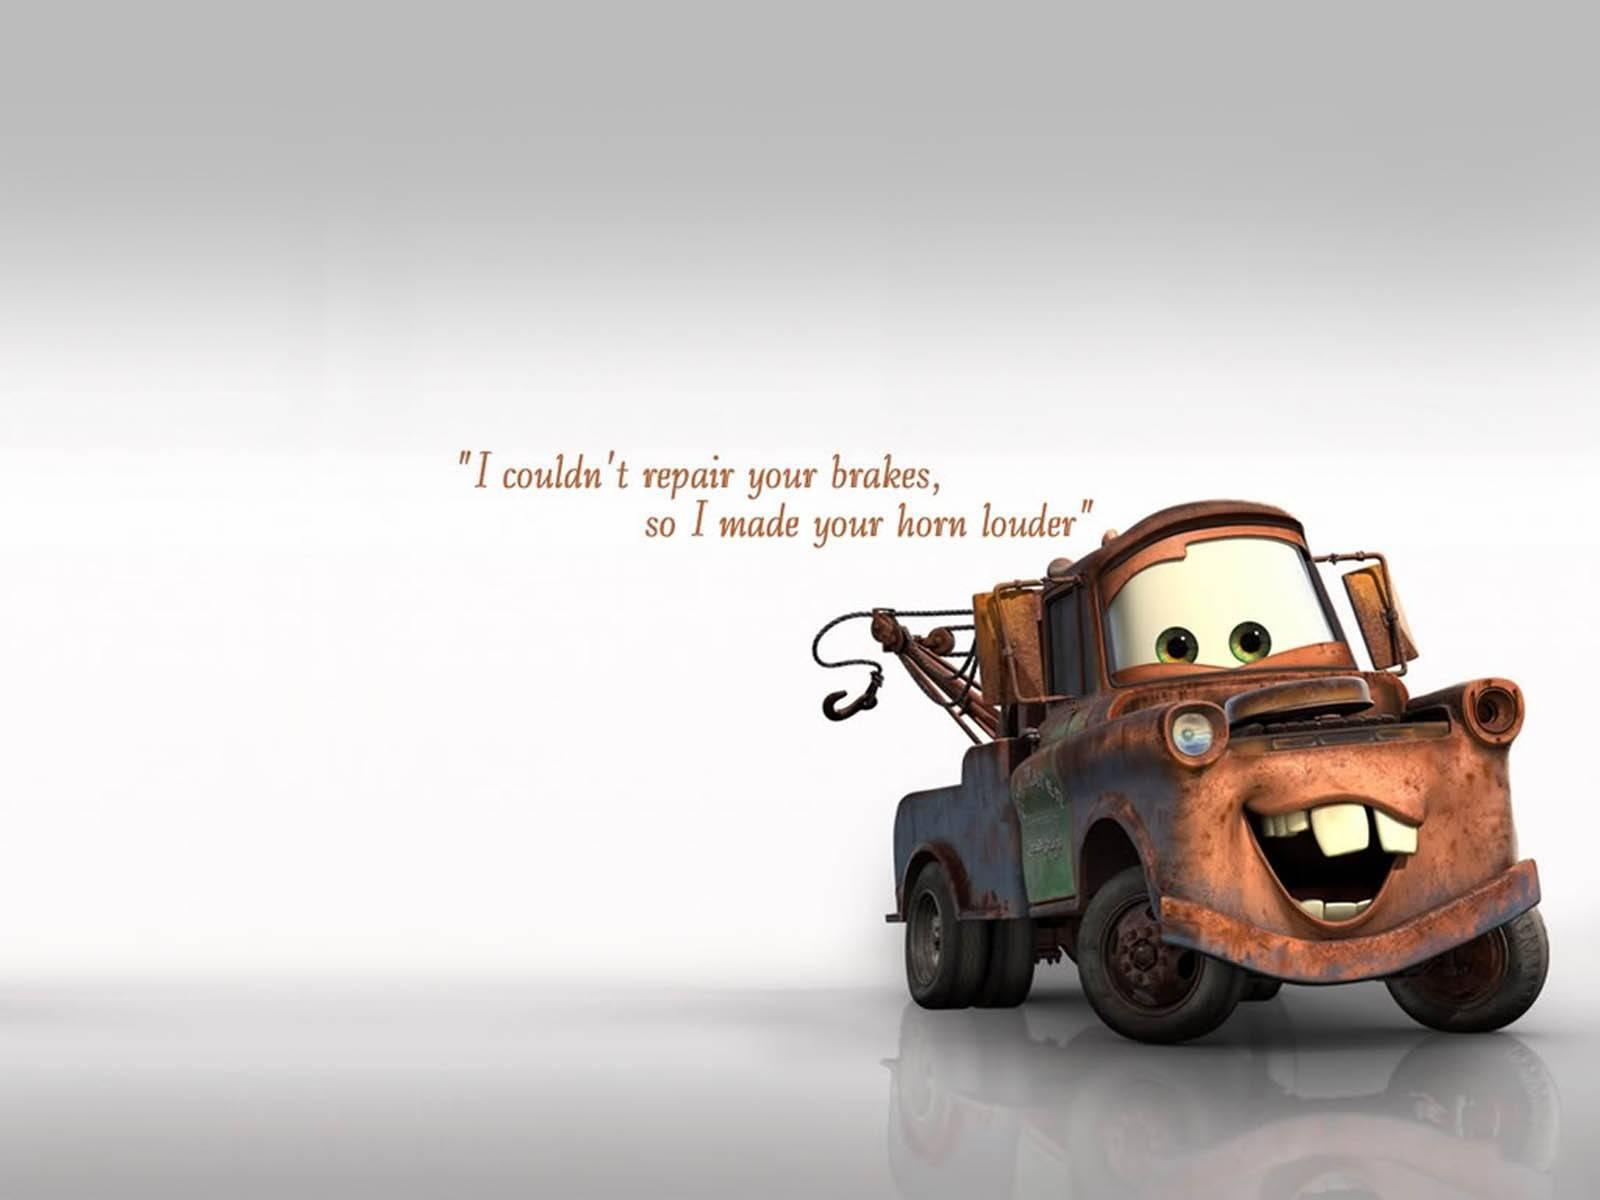 rocking car quotes images car quote